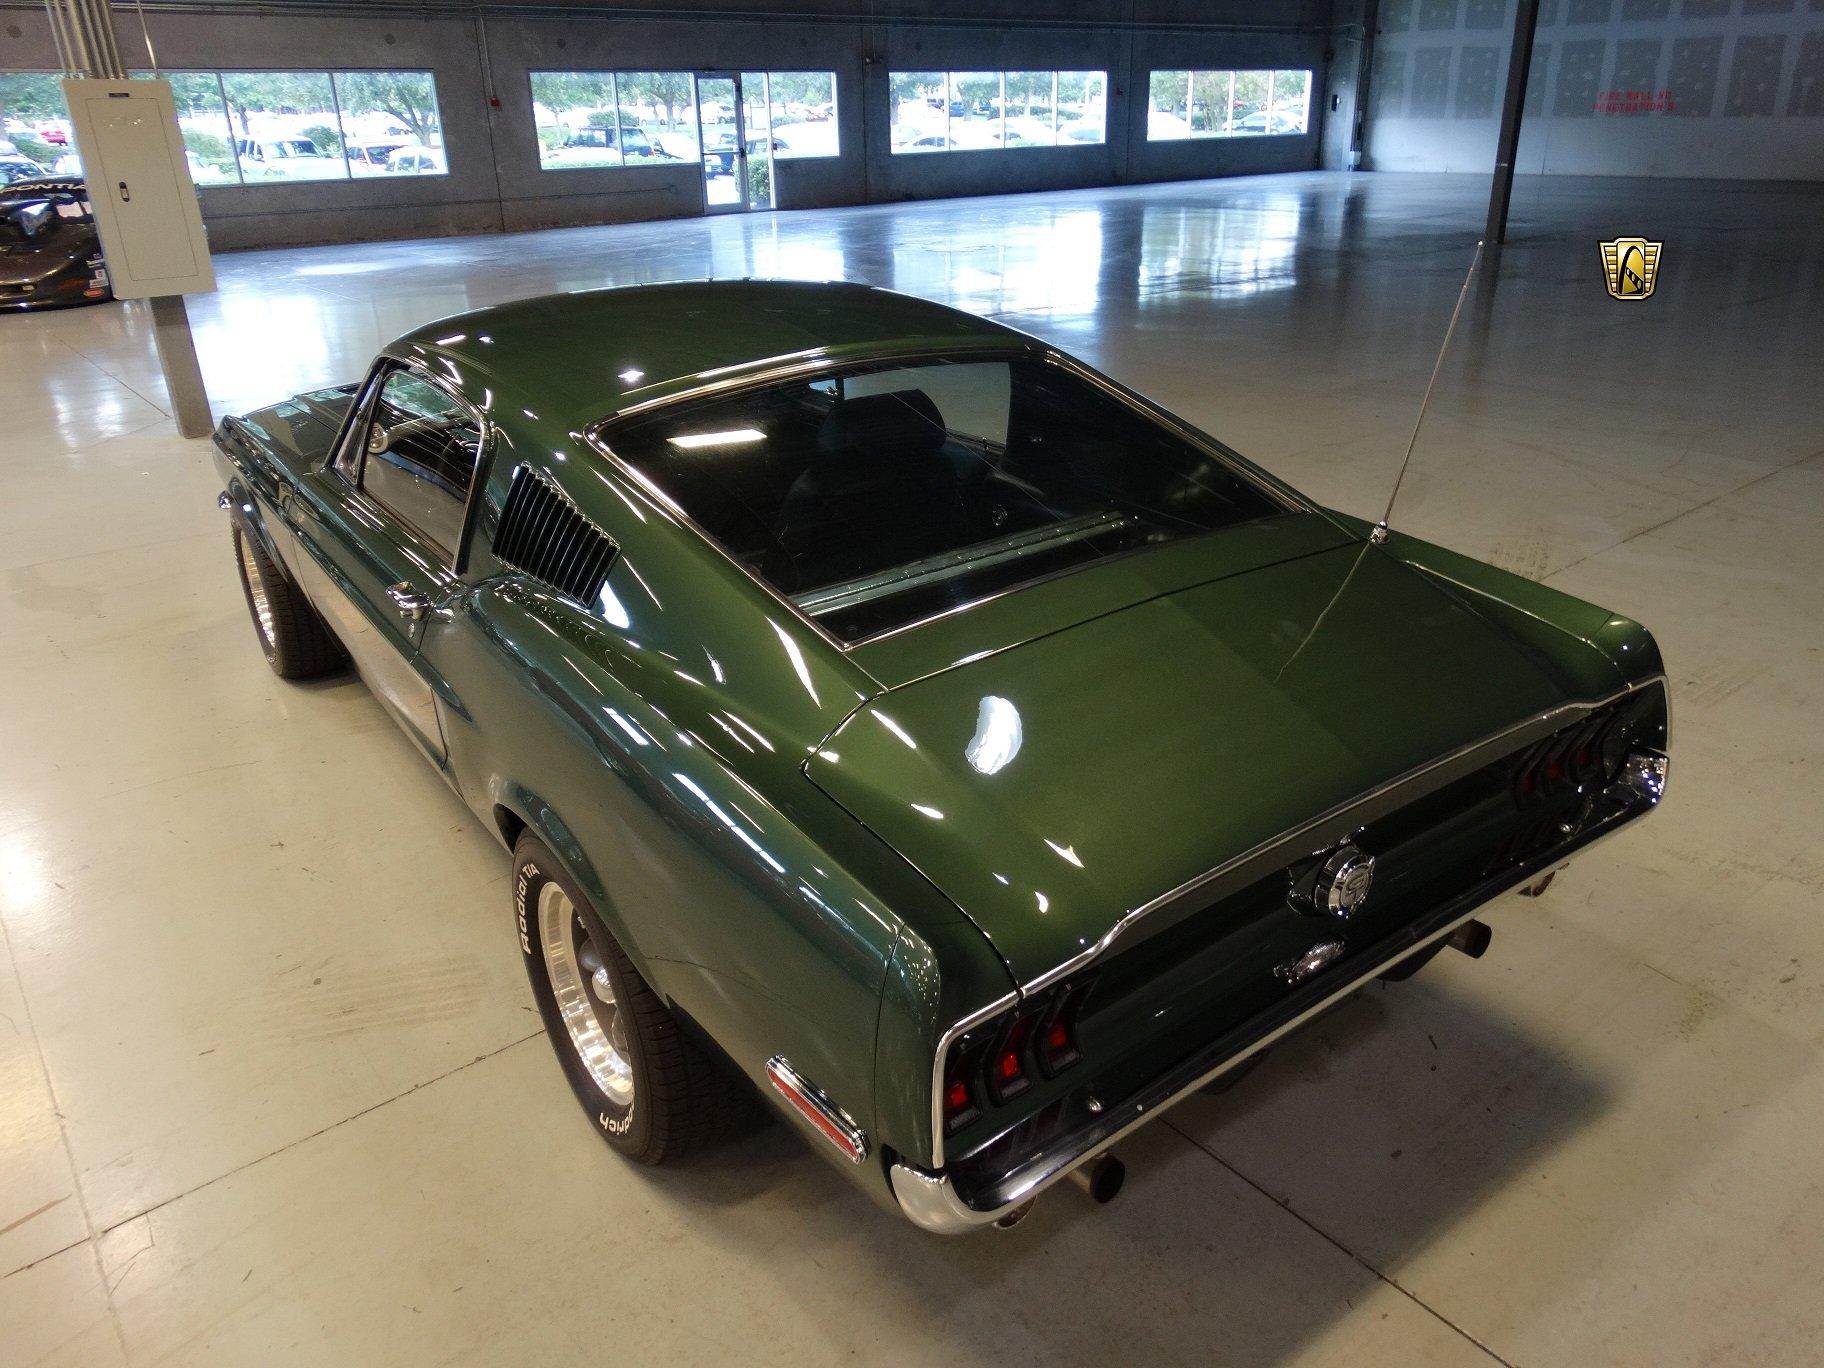 1968 Ford Mustang Bullitt 390 Fastback Green Cars Classic